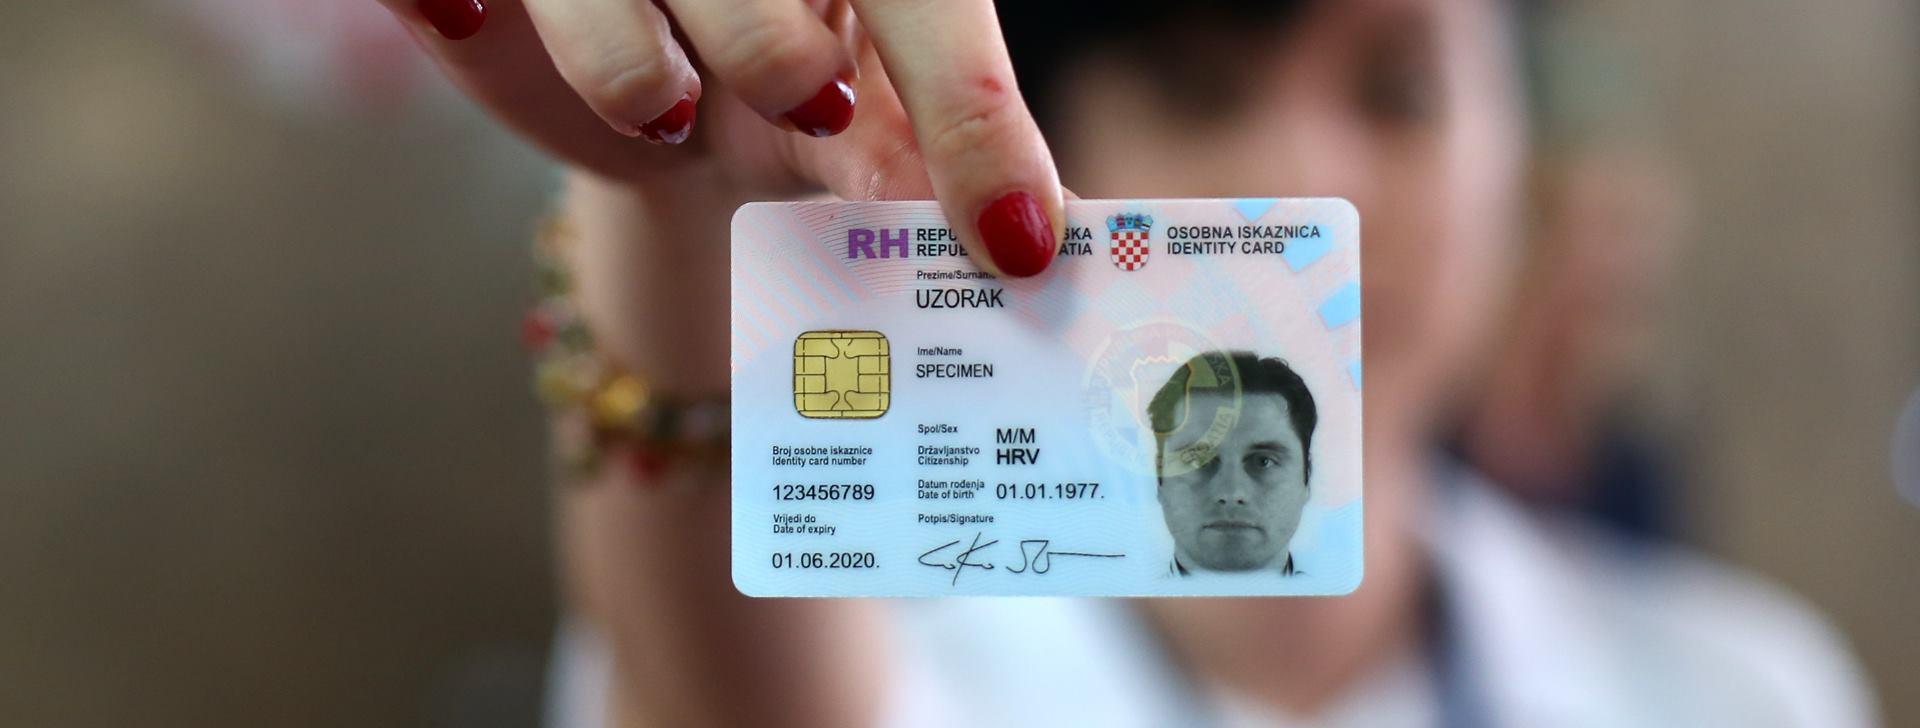 MUP Počelo izdavanje nove elektroničke osobne iskaznice